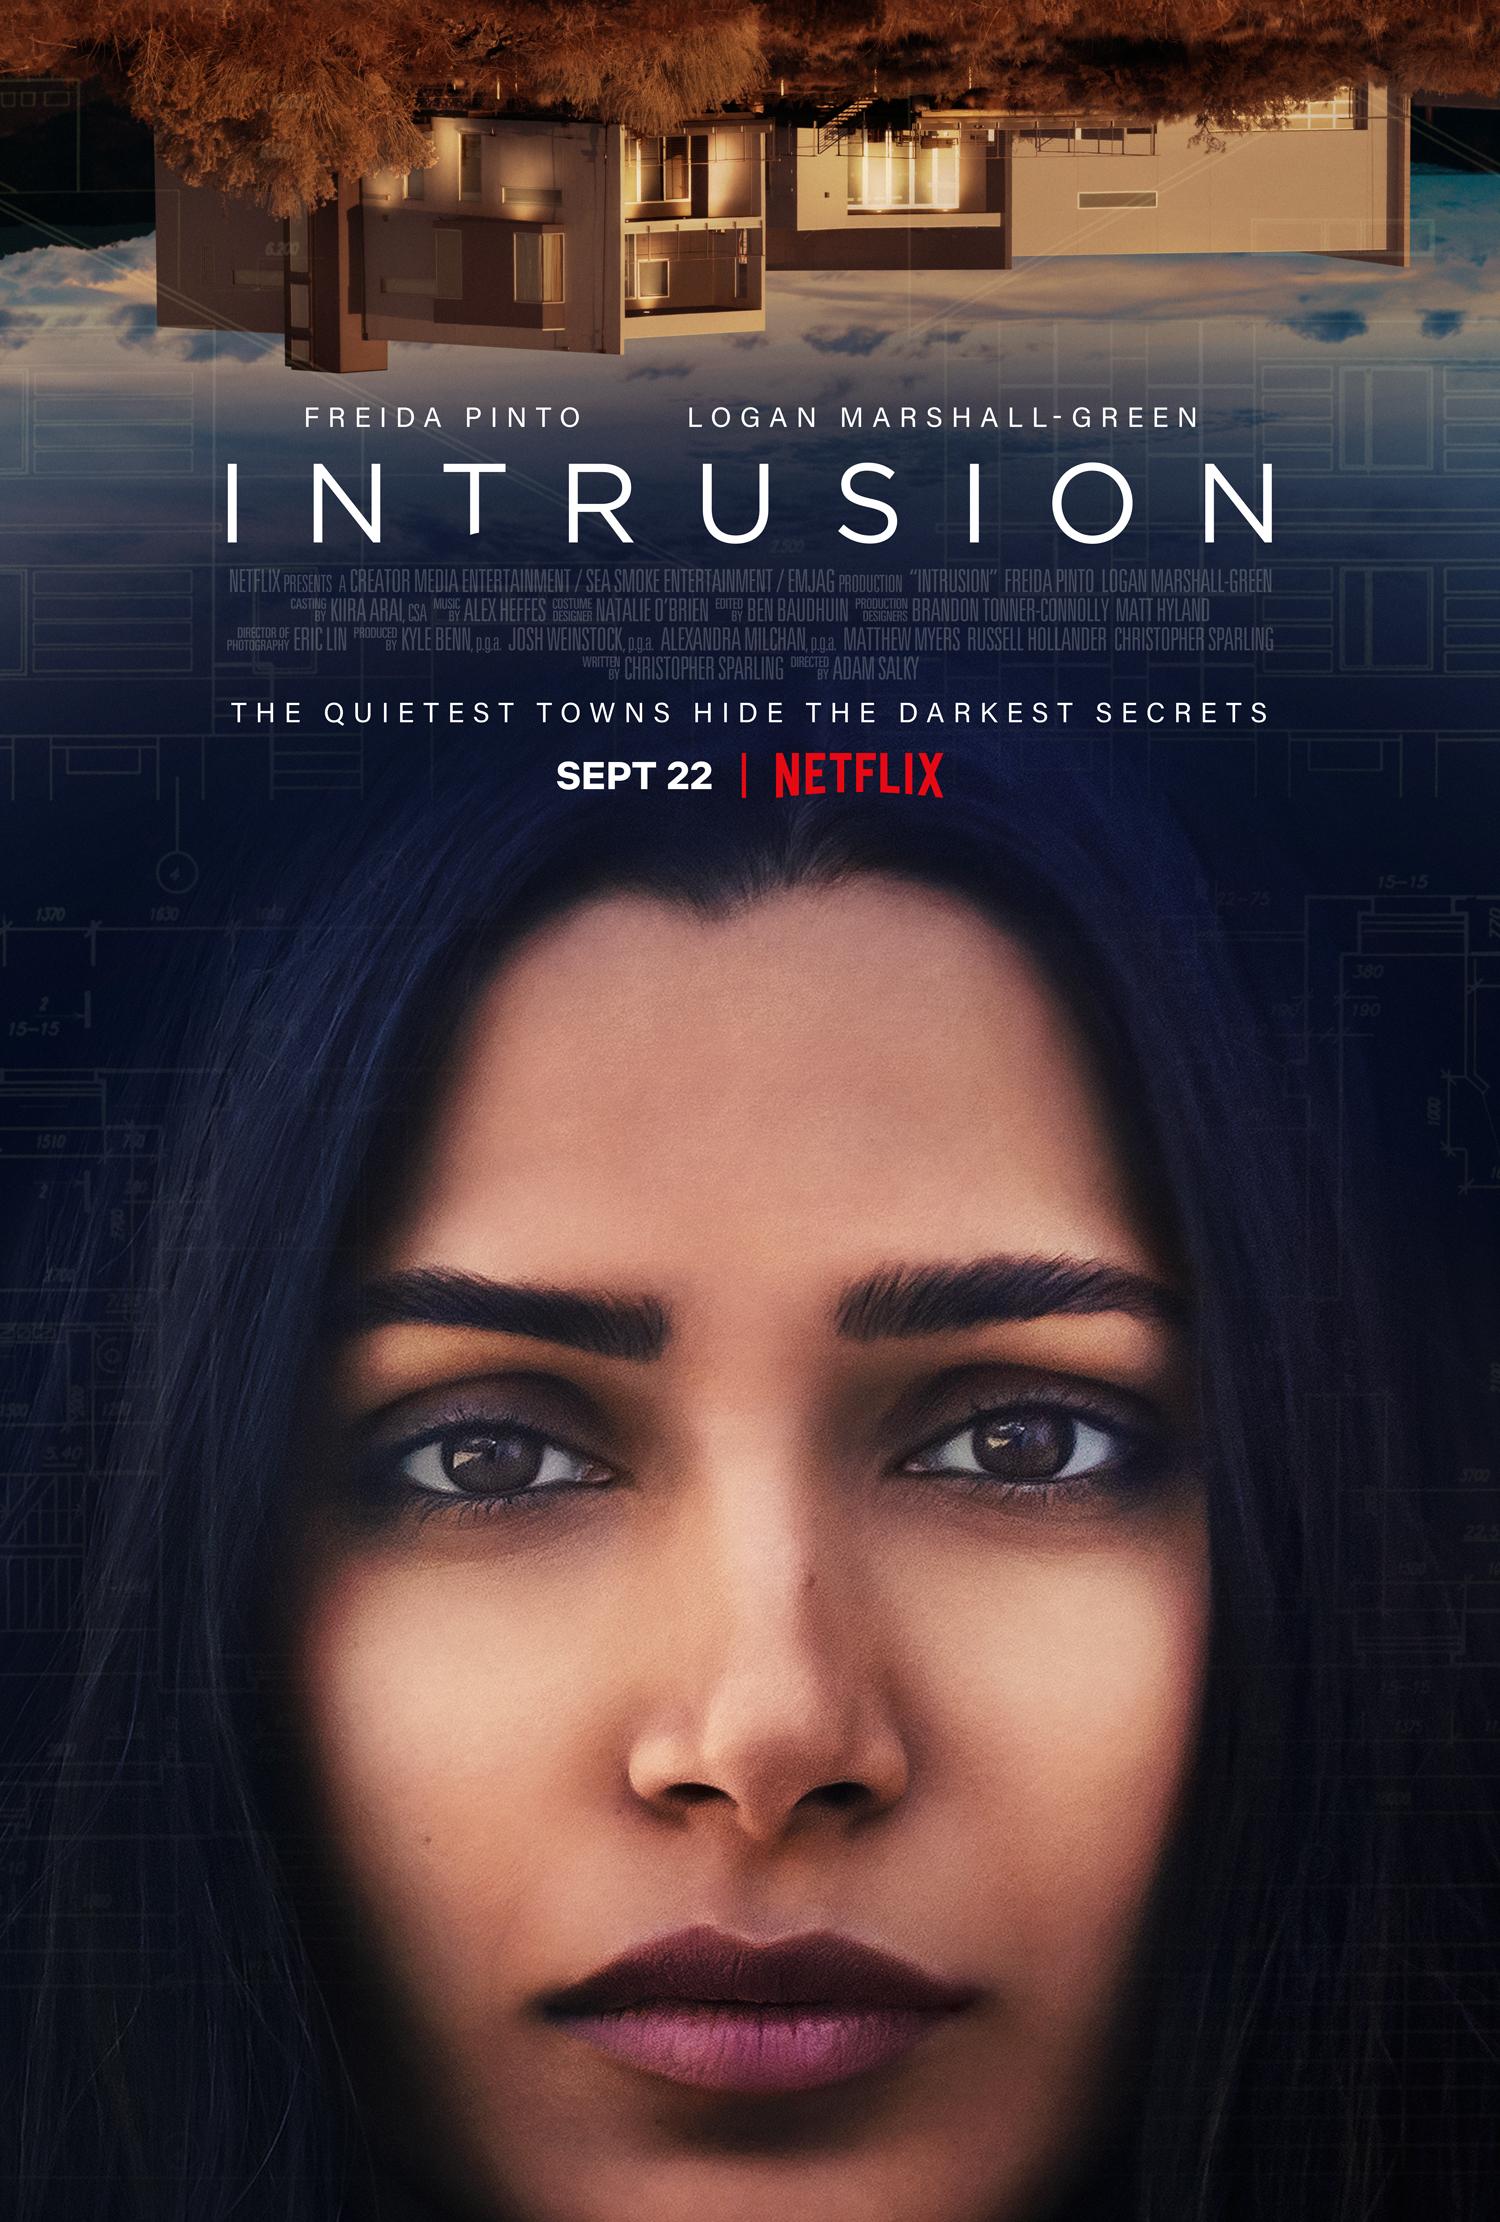 Intrusion 2021 Hindi ORG Dual Audio 1080p NF HDRip MSub 1.52GB Download